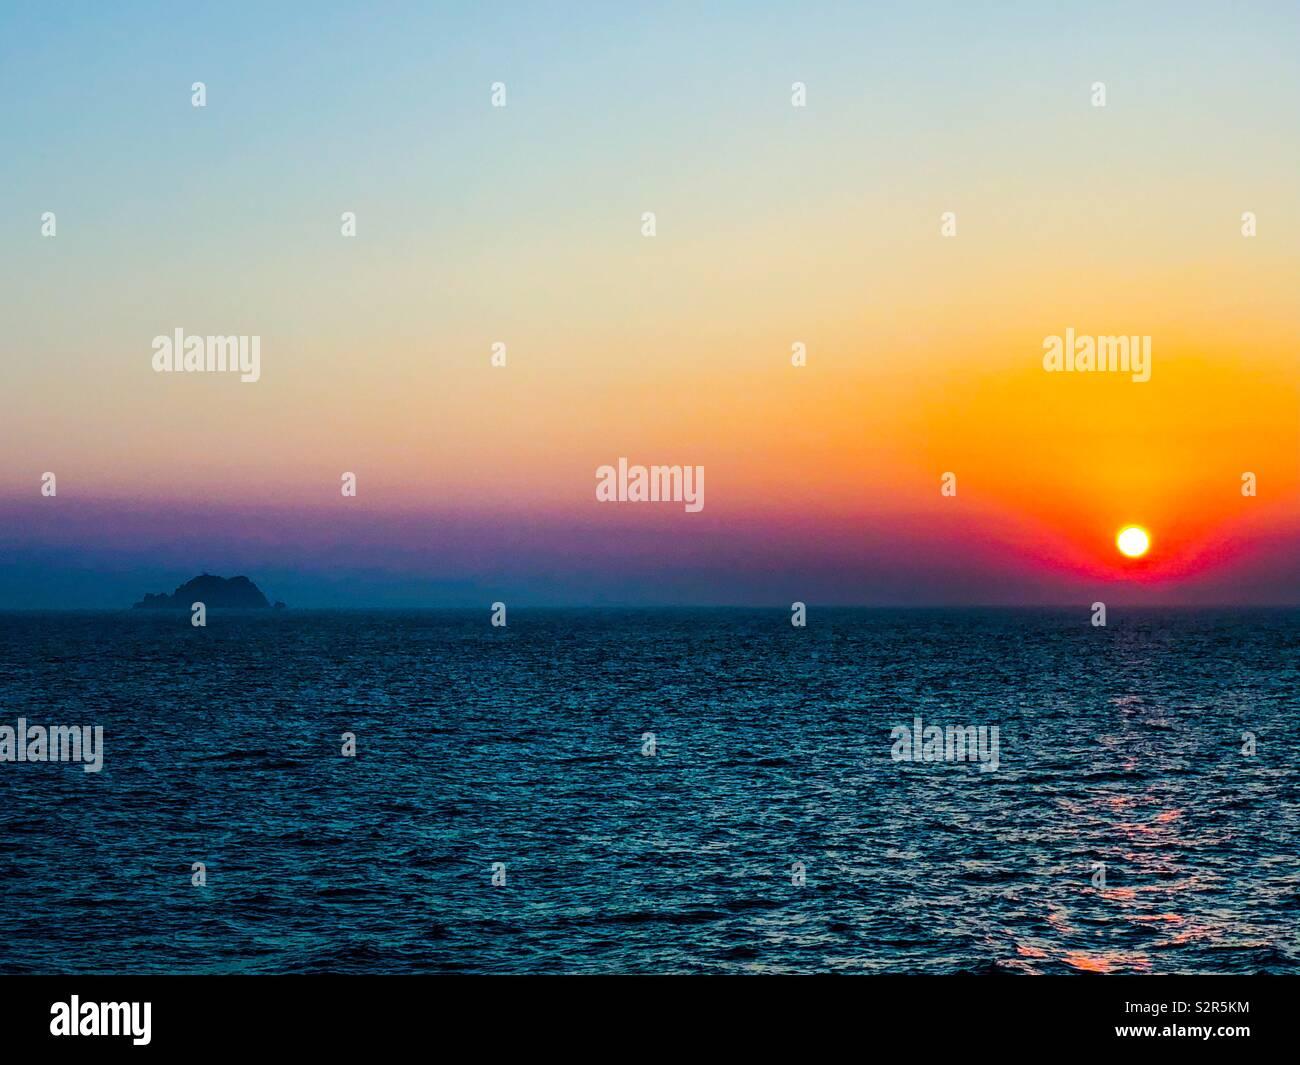 Sunset in the East China Sea near Busan, South Korea - Stock Image